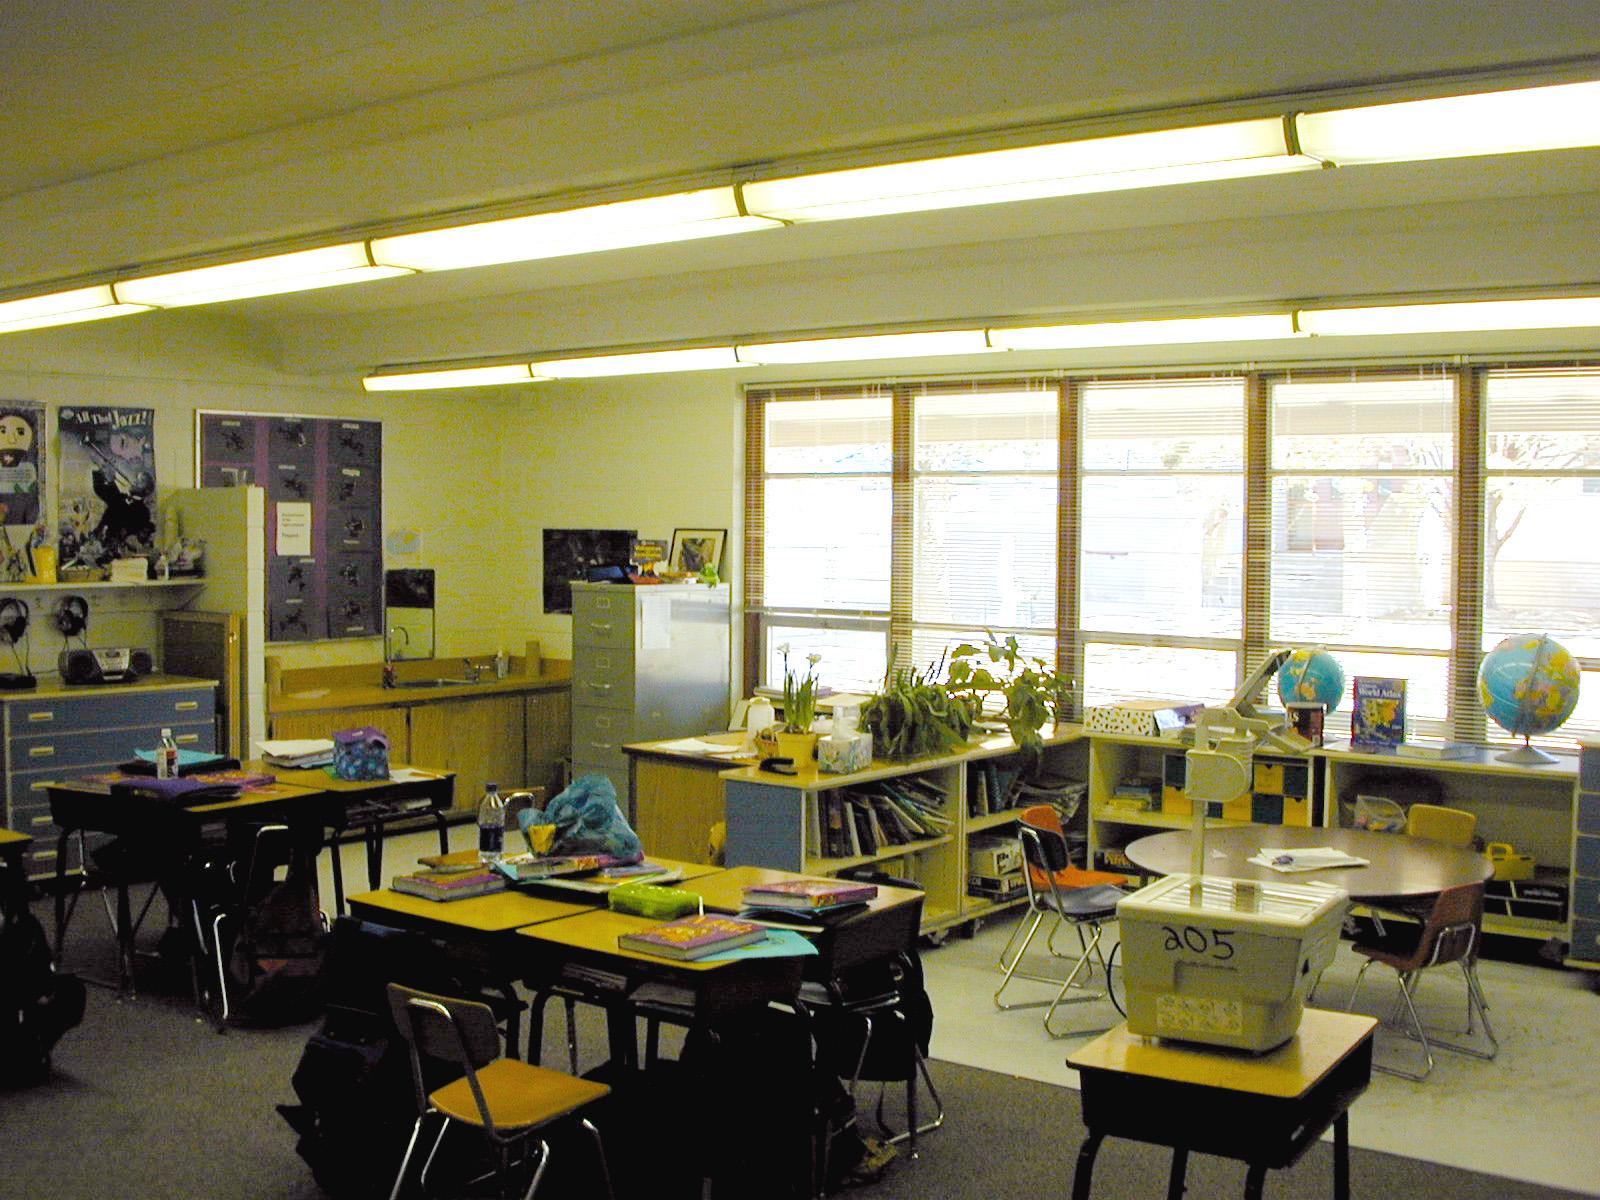 MacArthur_Elementary_School_03.jpg